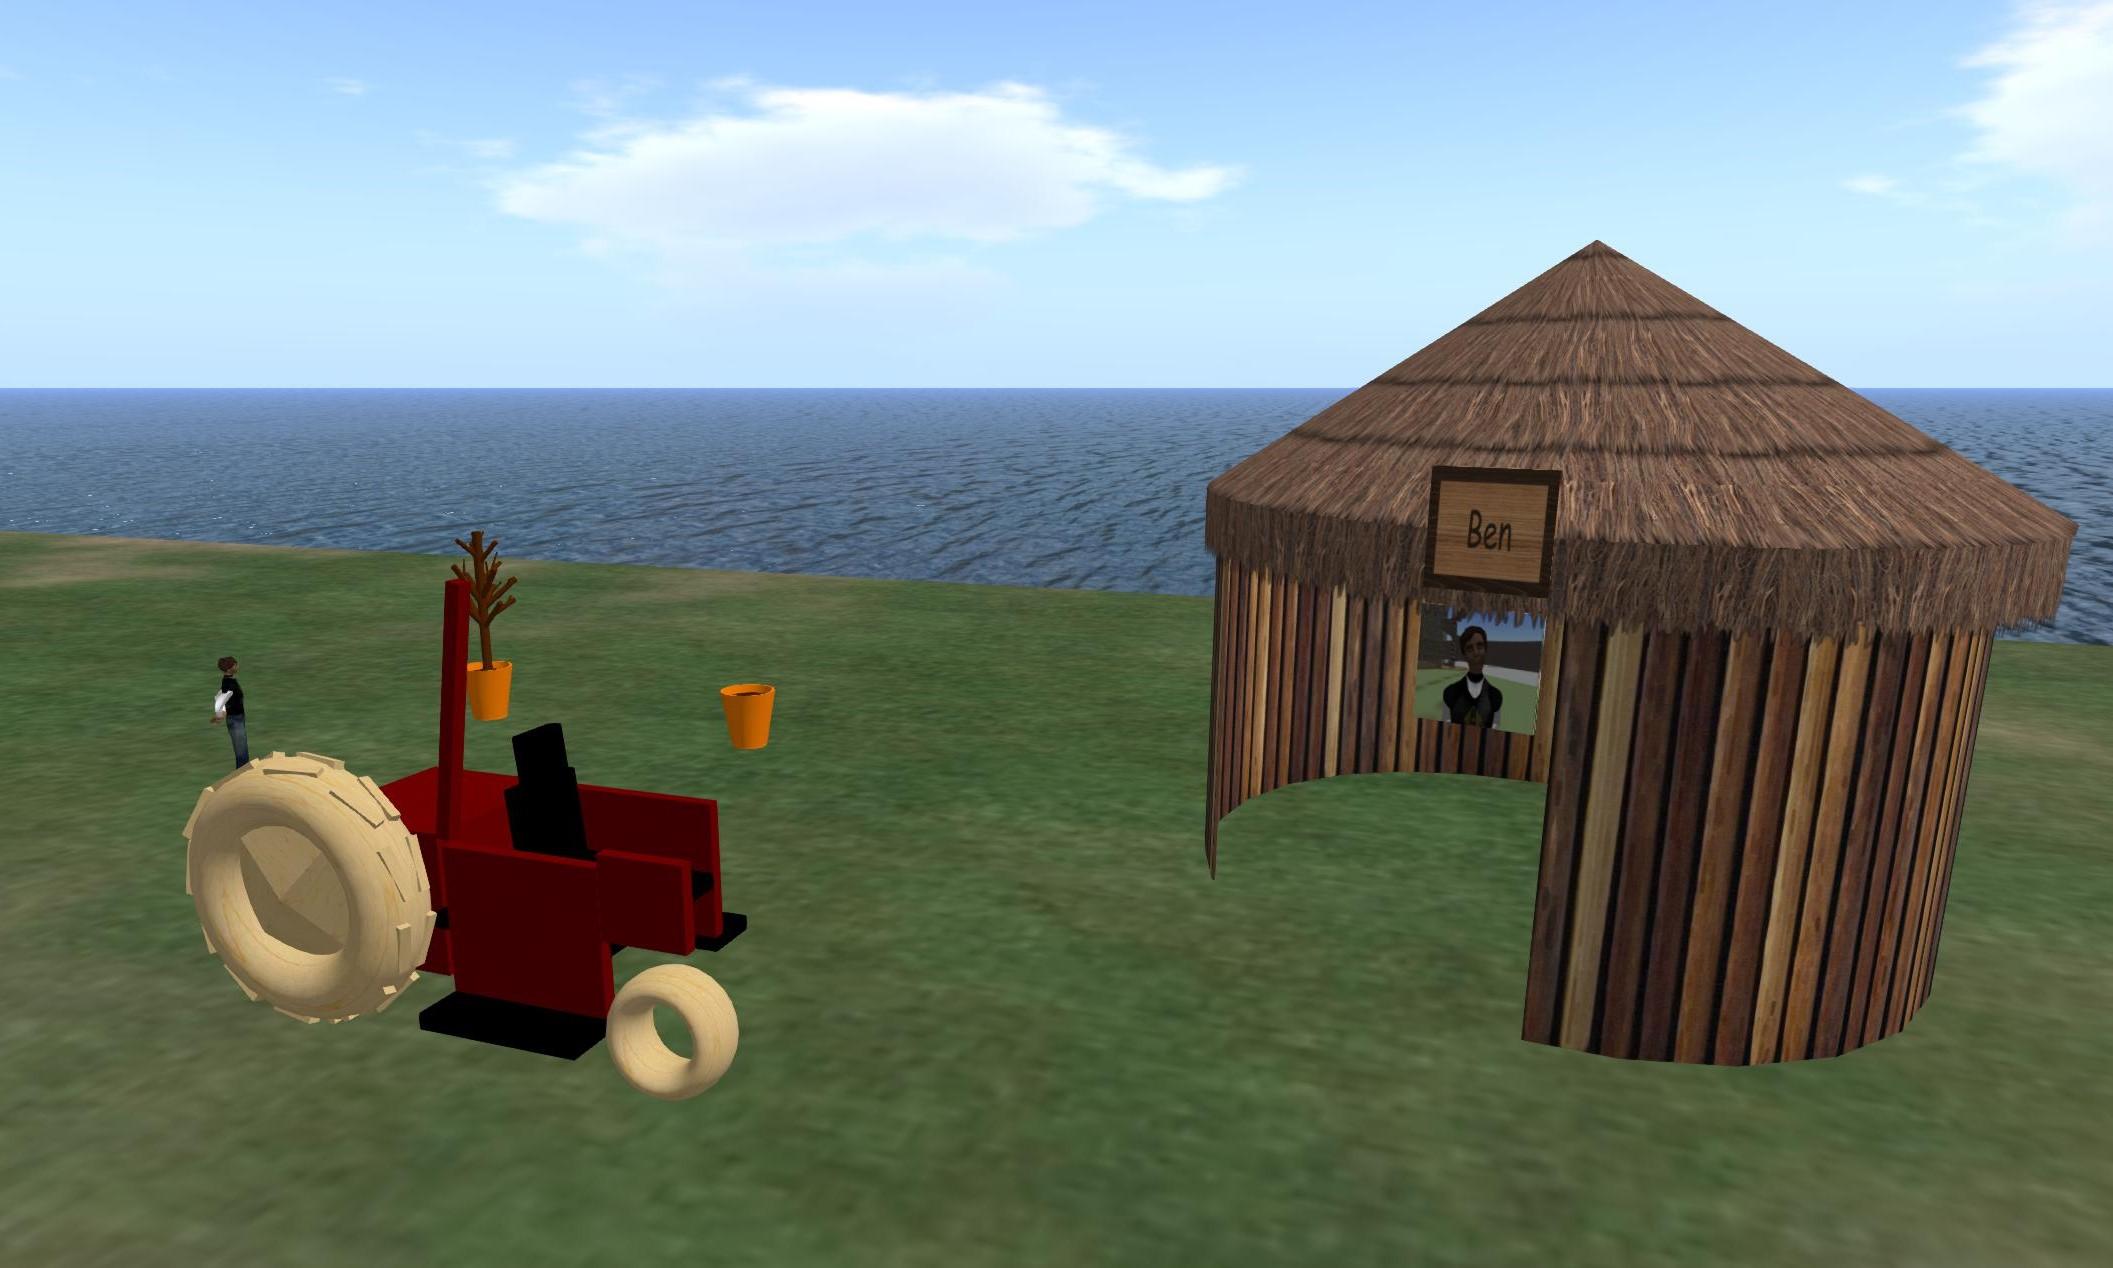 Ben's Tractor project